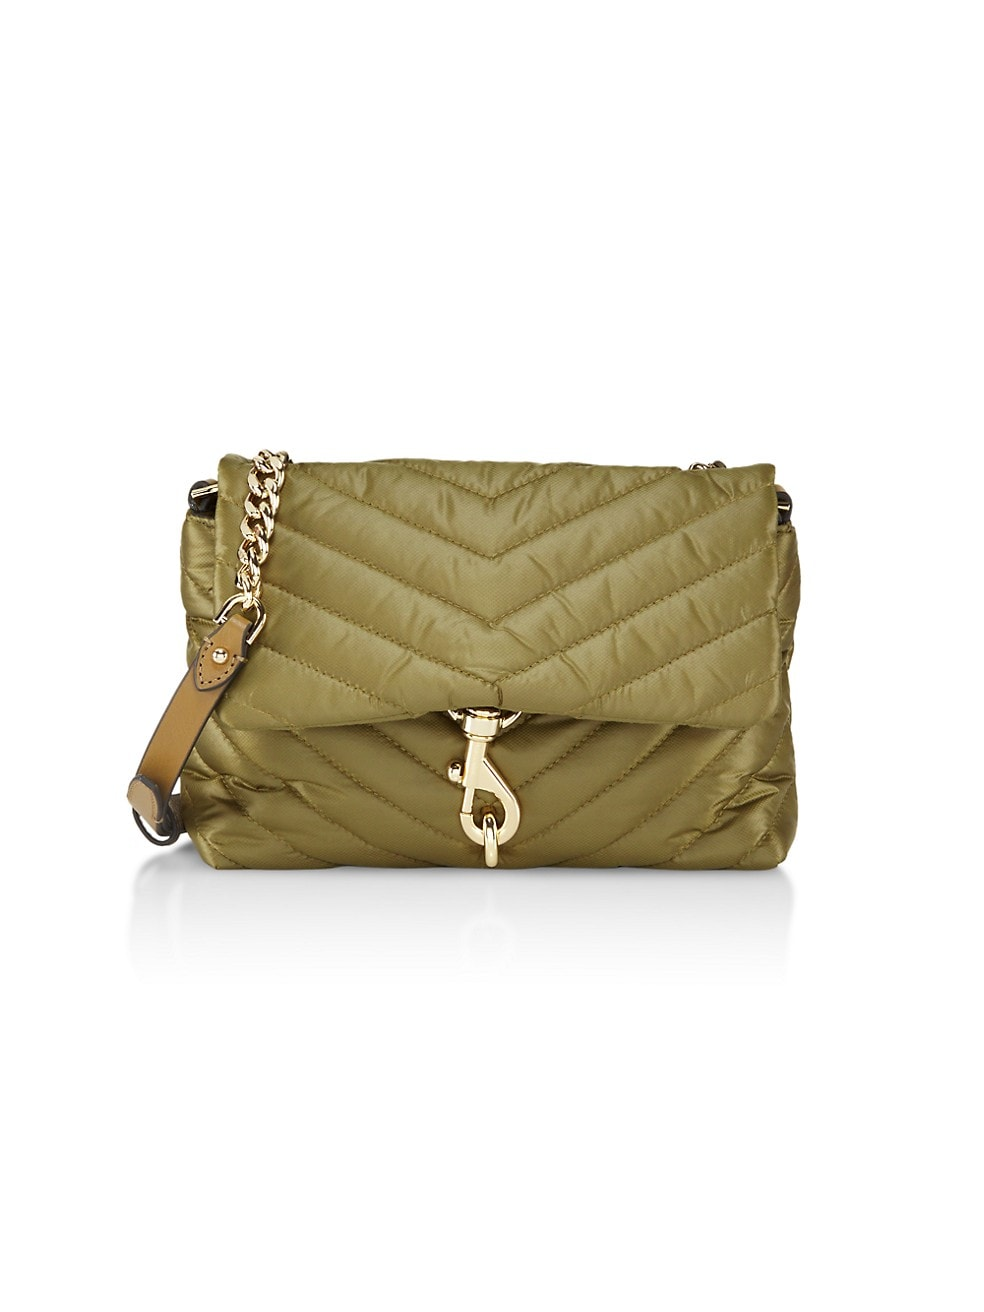 Rebecca Minkoff: Jumbo Edie Quilted Nylon Shoulder Bag $55.18